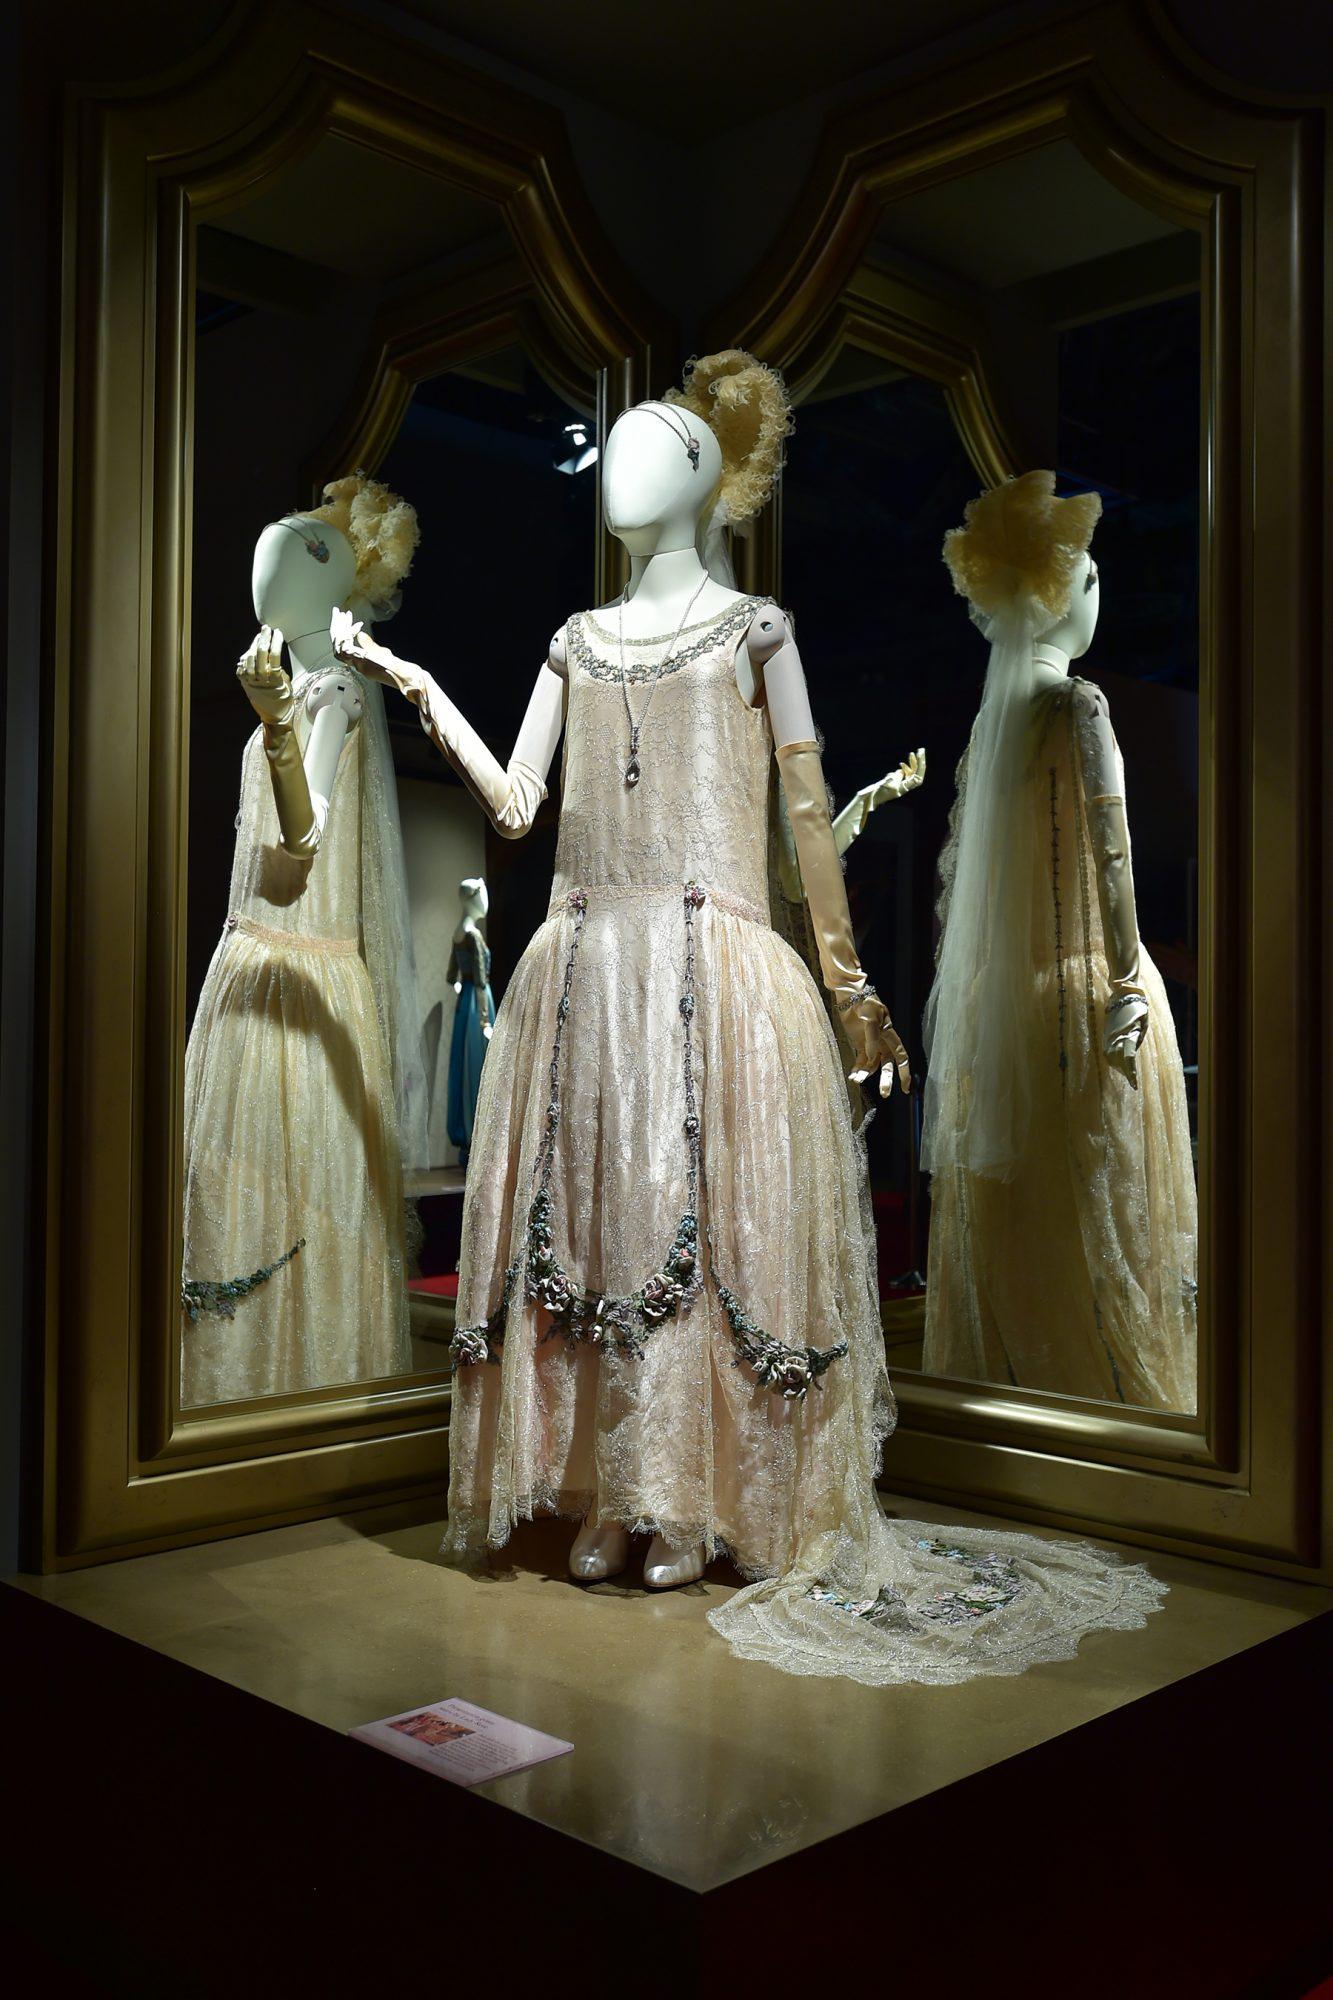 Downton Abbey Exhibition in New YorkCR. Fabian Leow